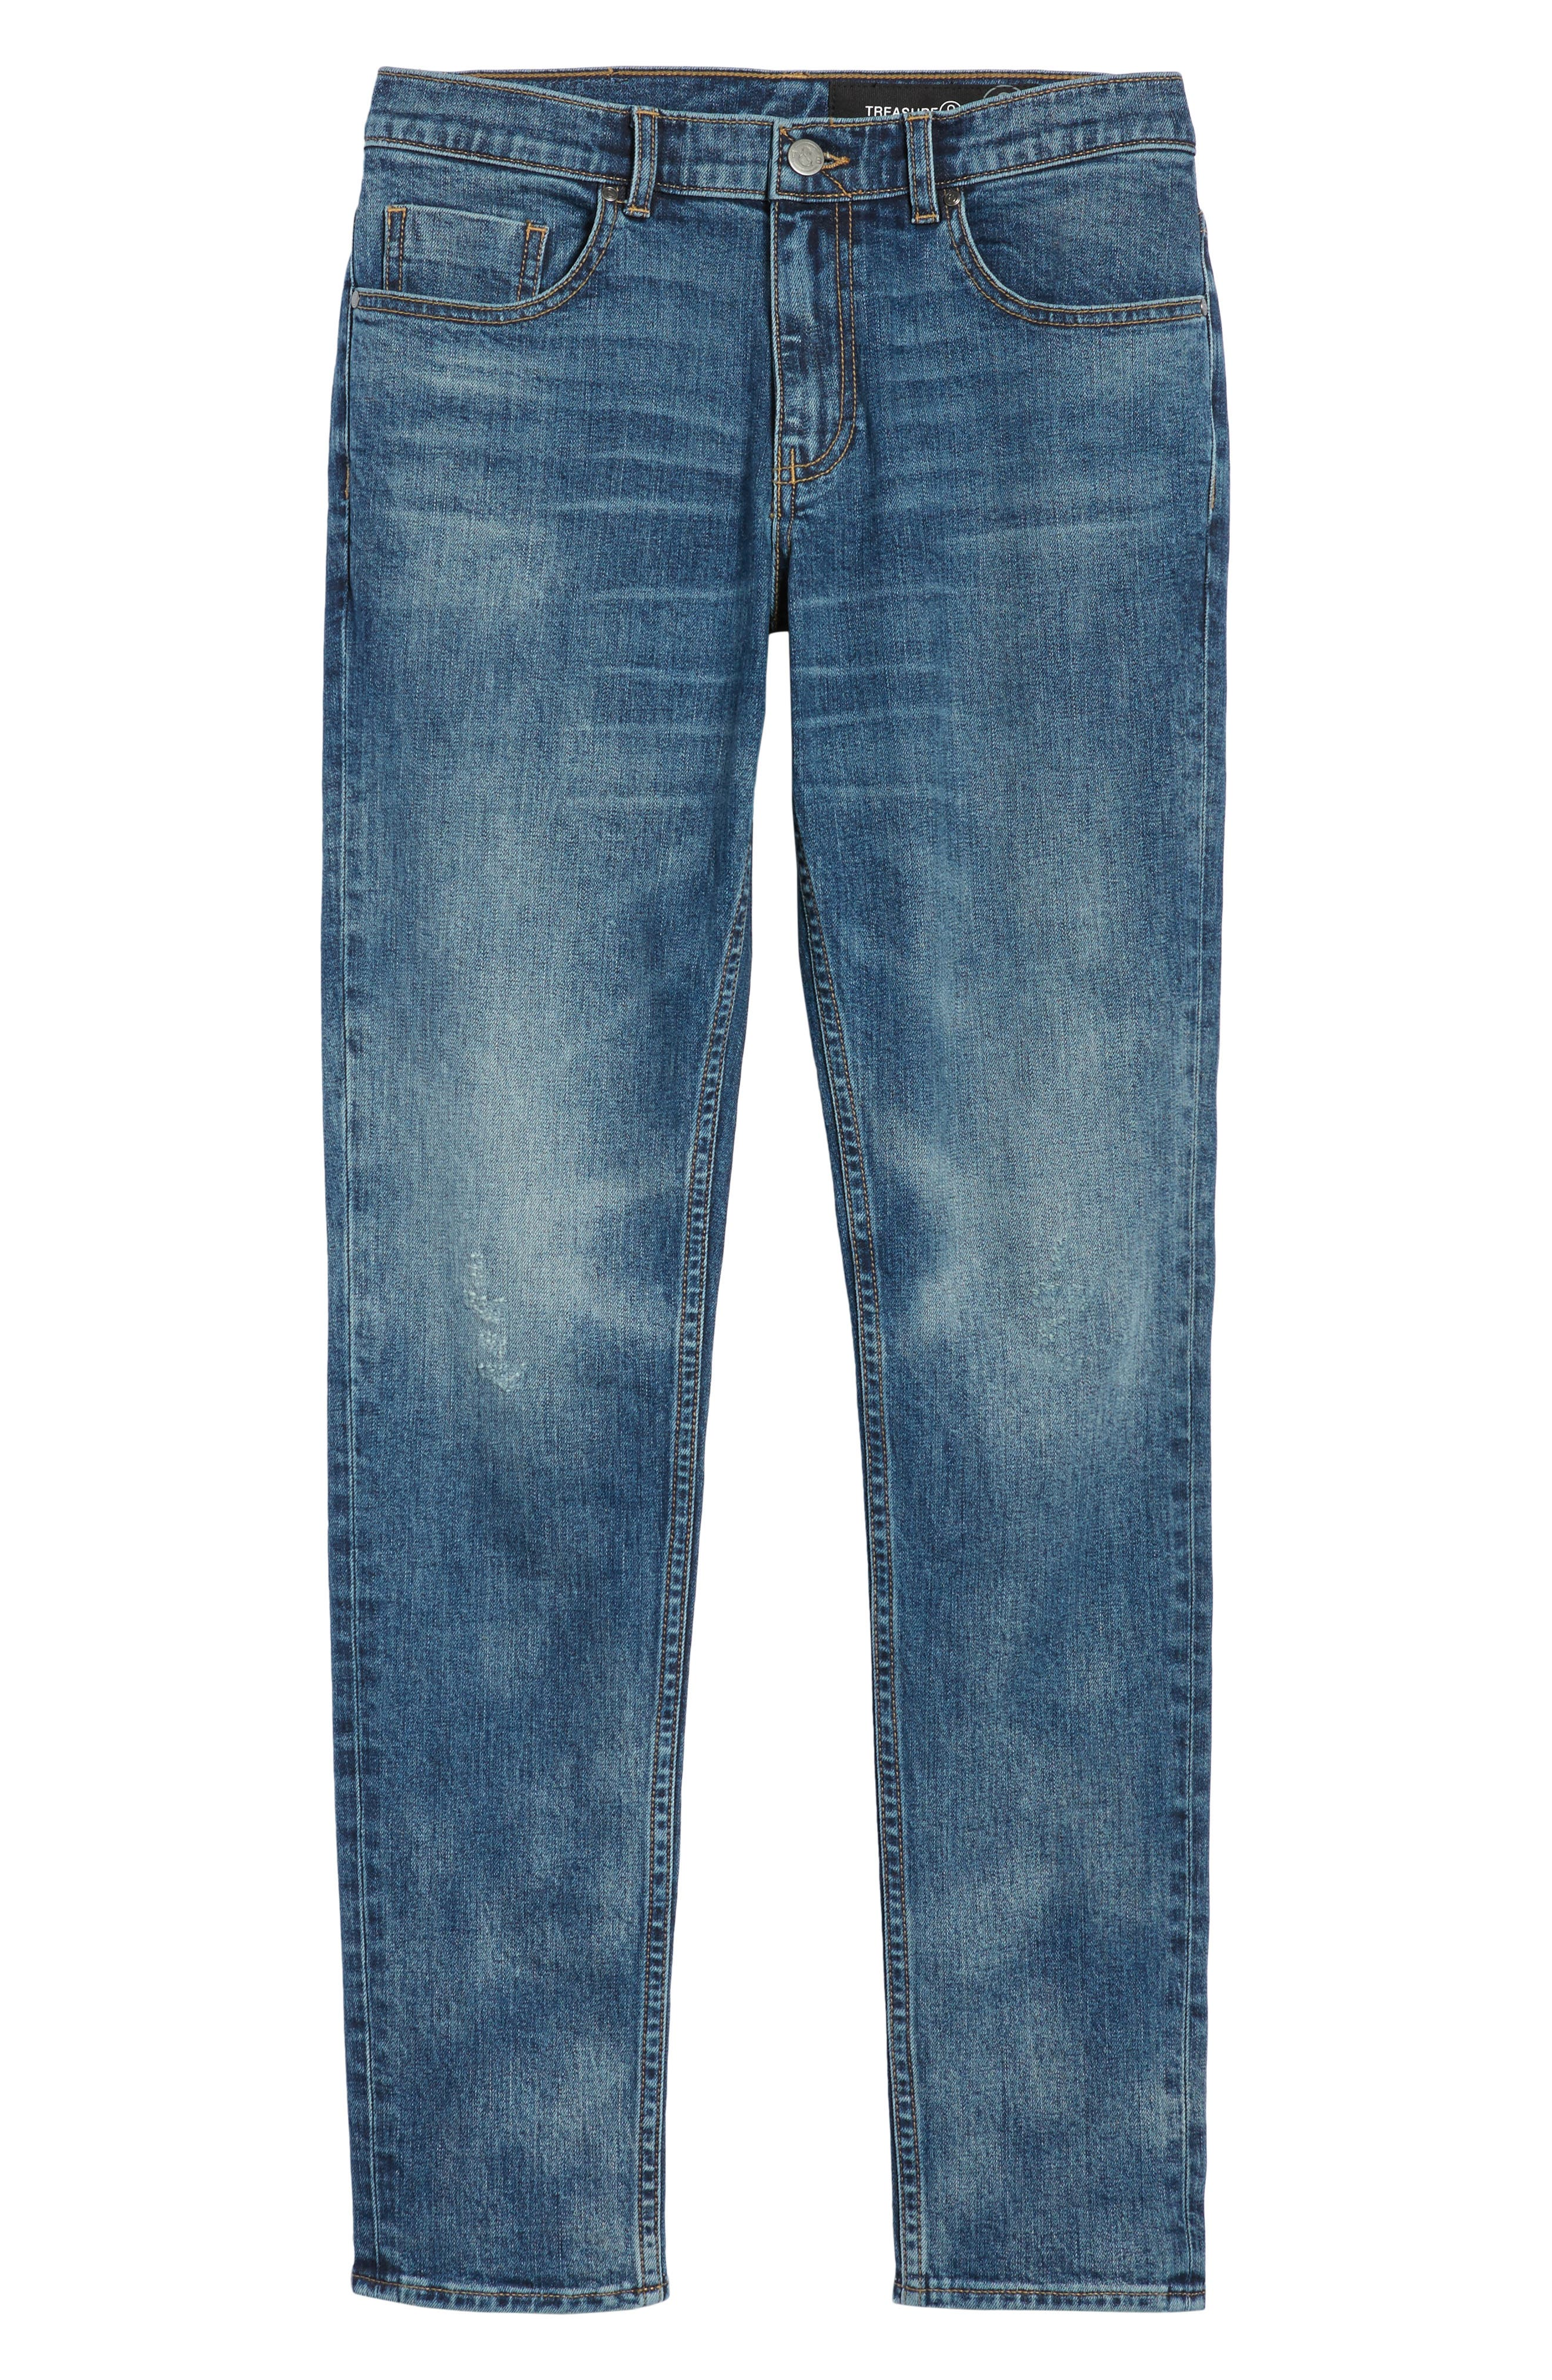 Skinny Fit Jeans,                             Alternate thumbnail 6, color,